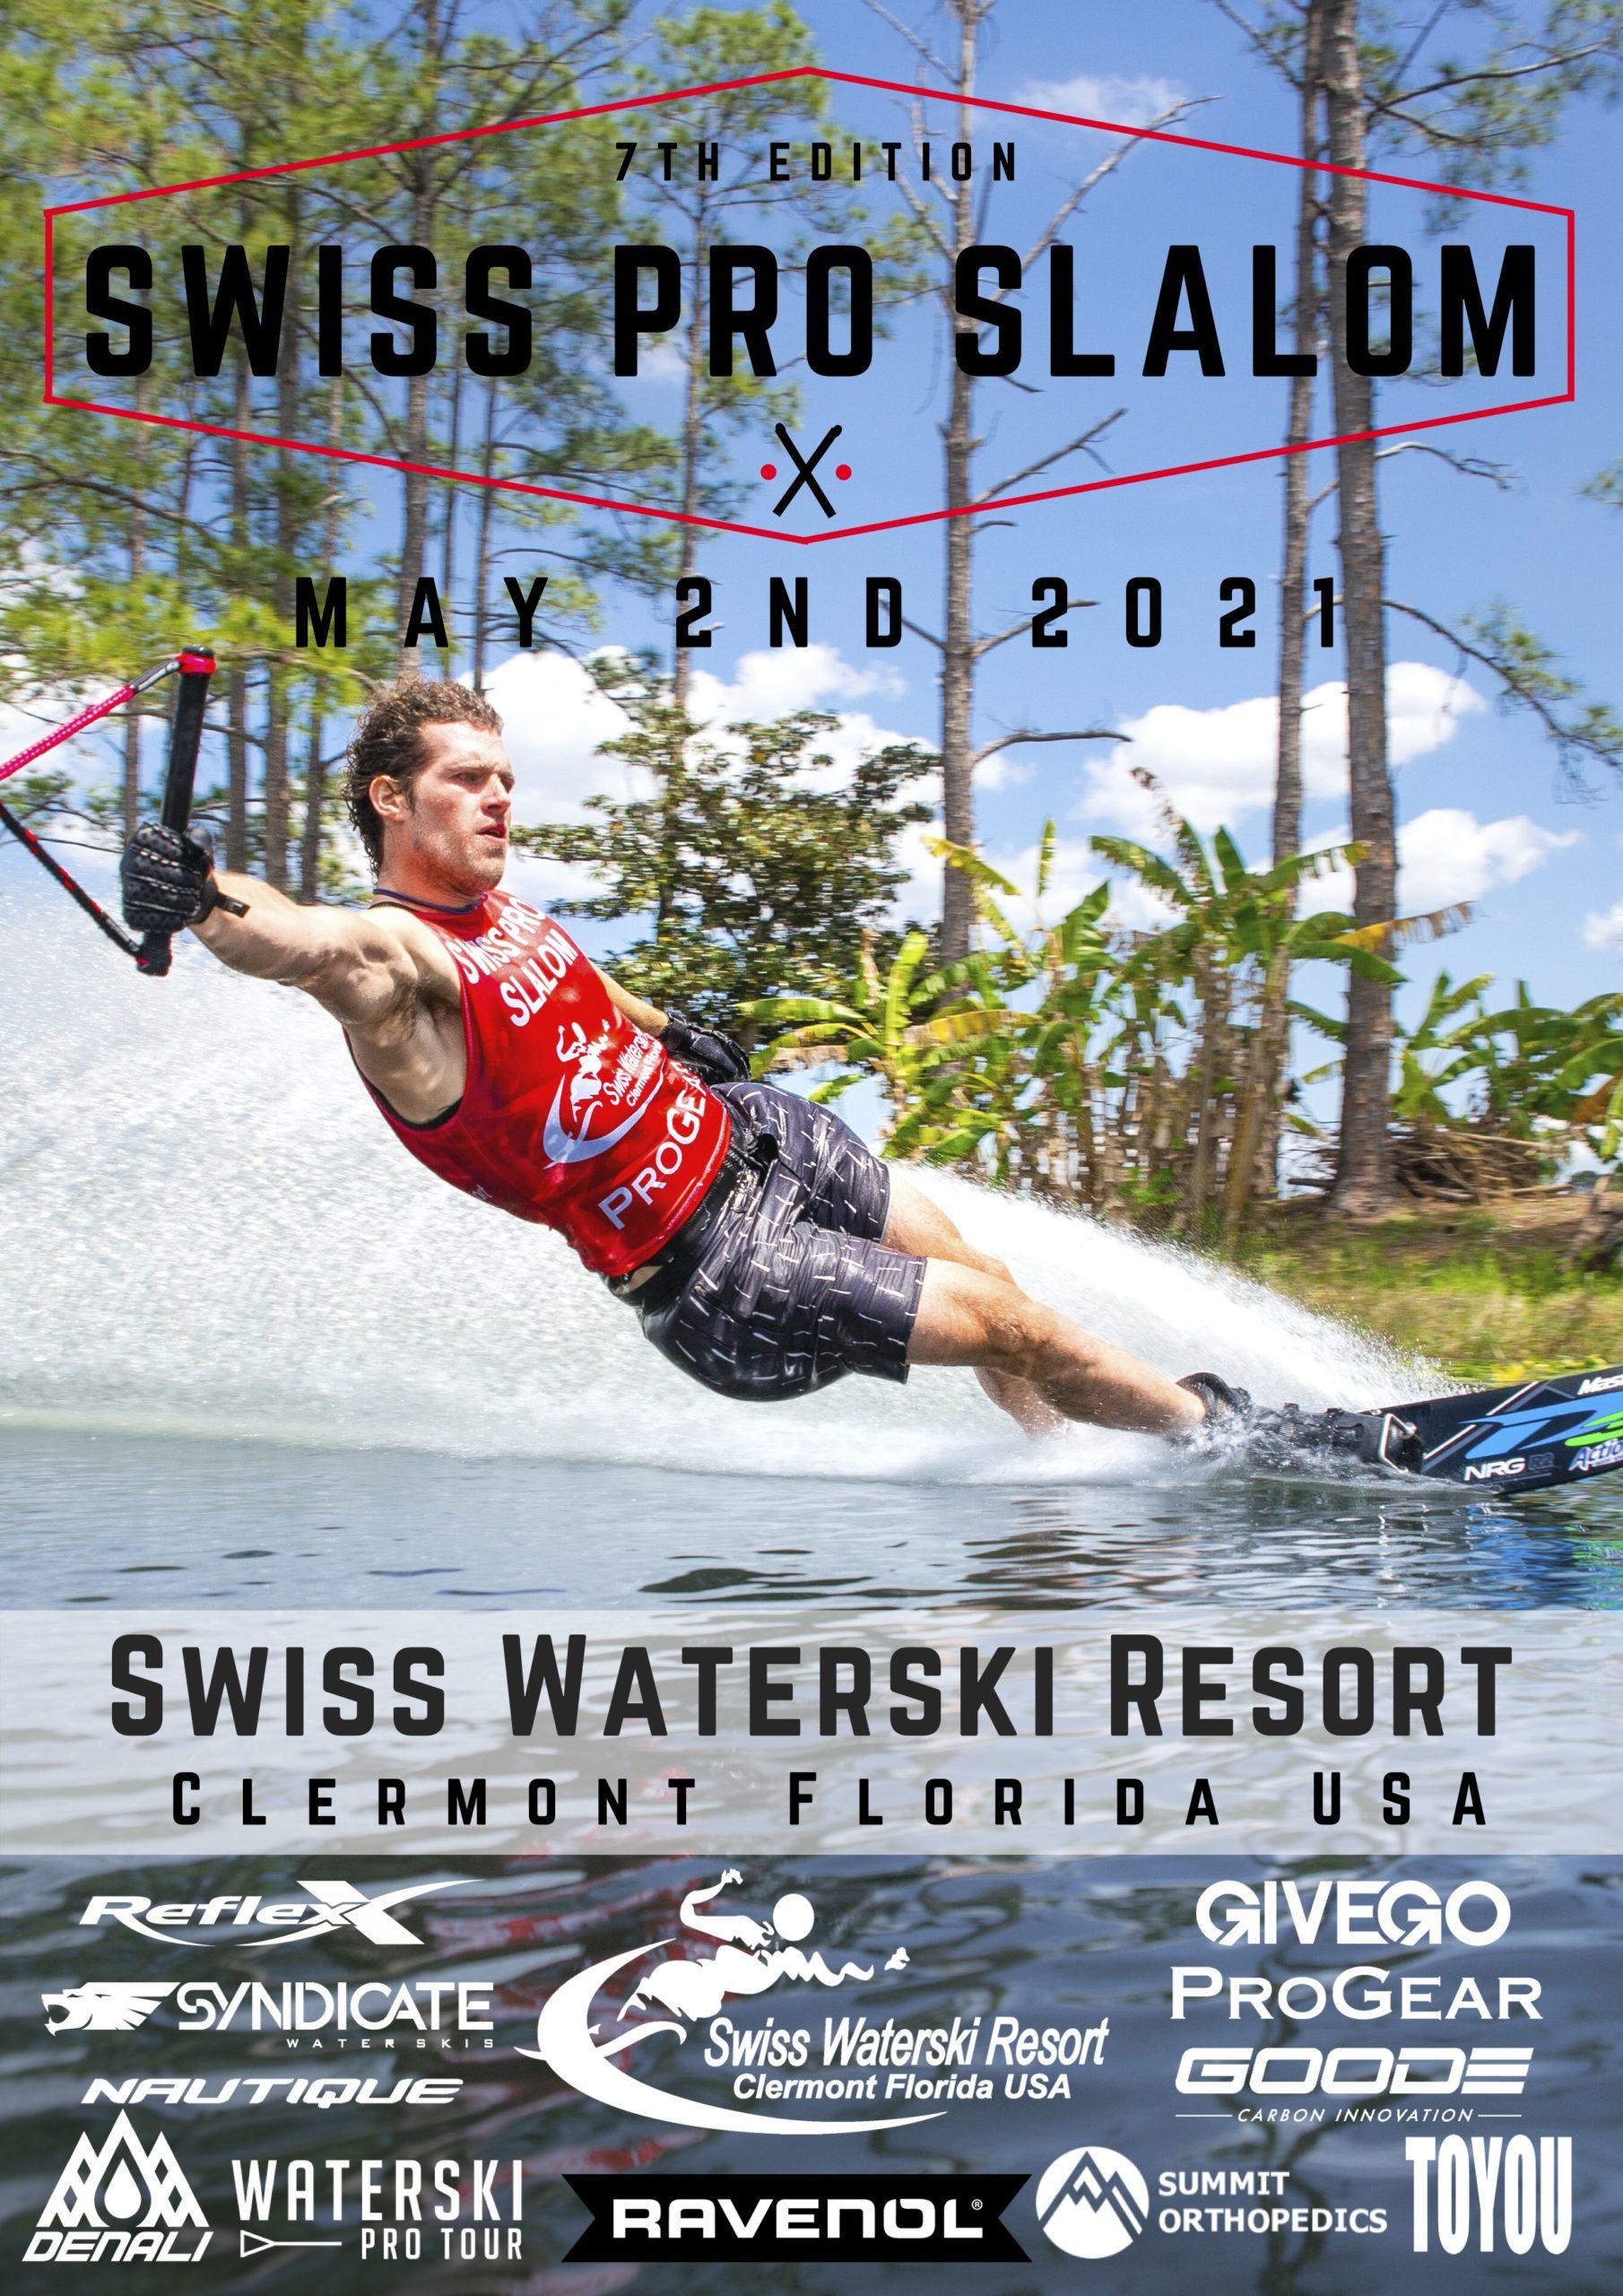 SwissProSlalom-Poster FINAL